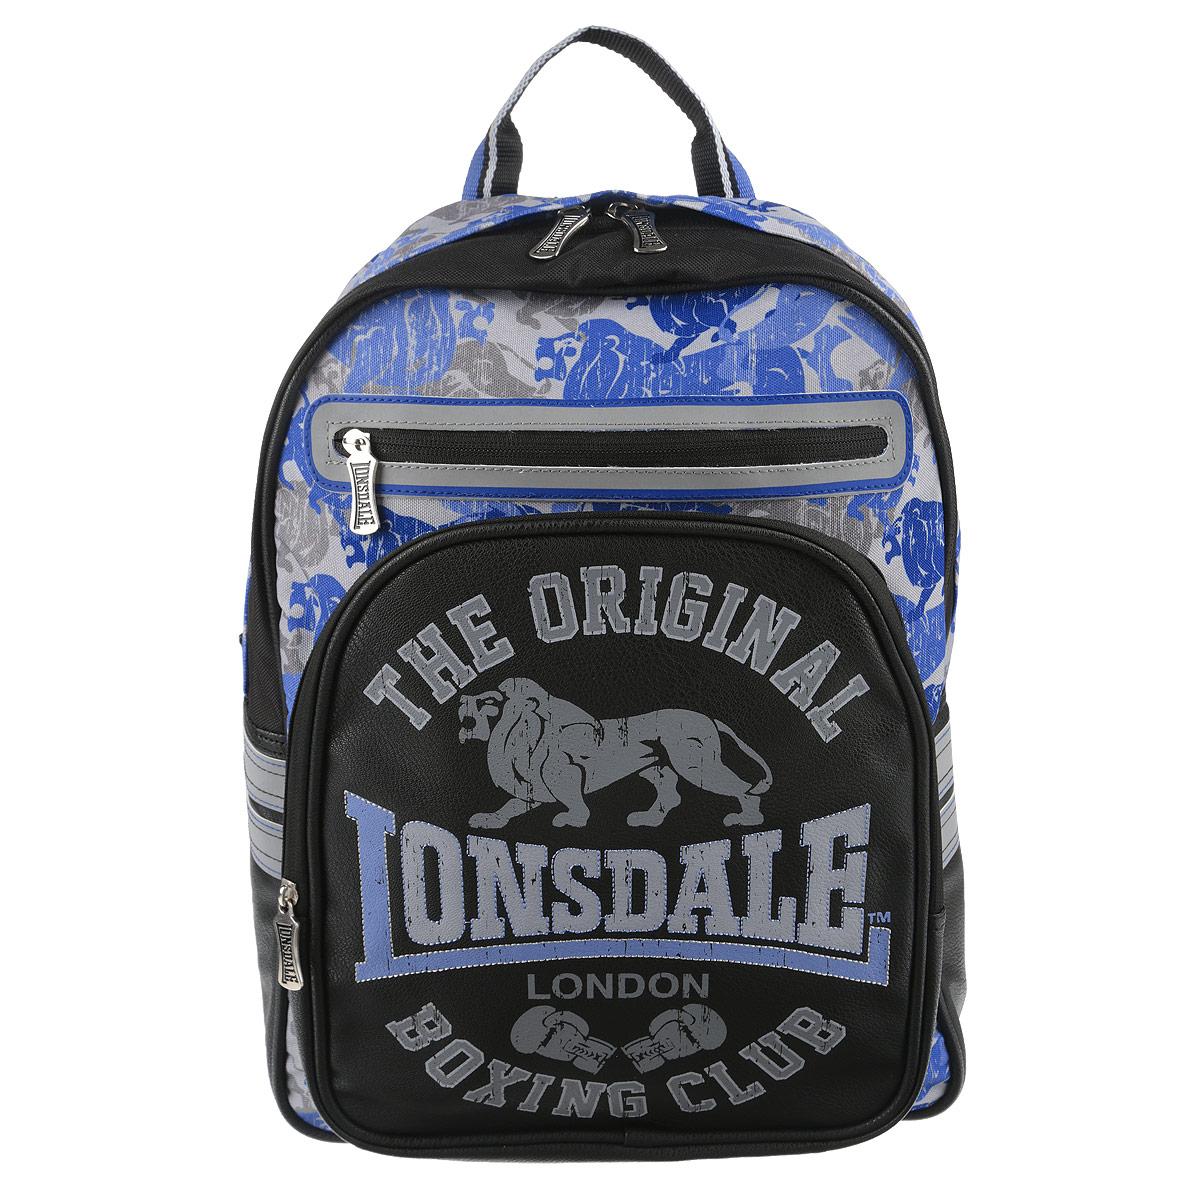 Рюкзак школьный Kinderline Lonsdale, цвет: черный, голубой, серый. LSCB-UT1-507 сумка kinderline international mhbz us1 51box5 v3